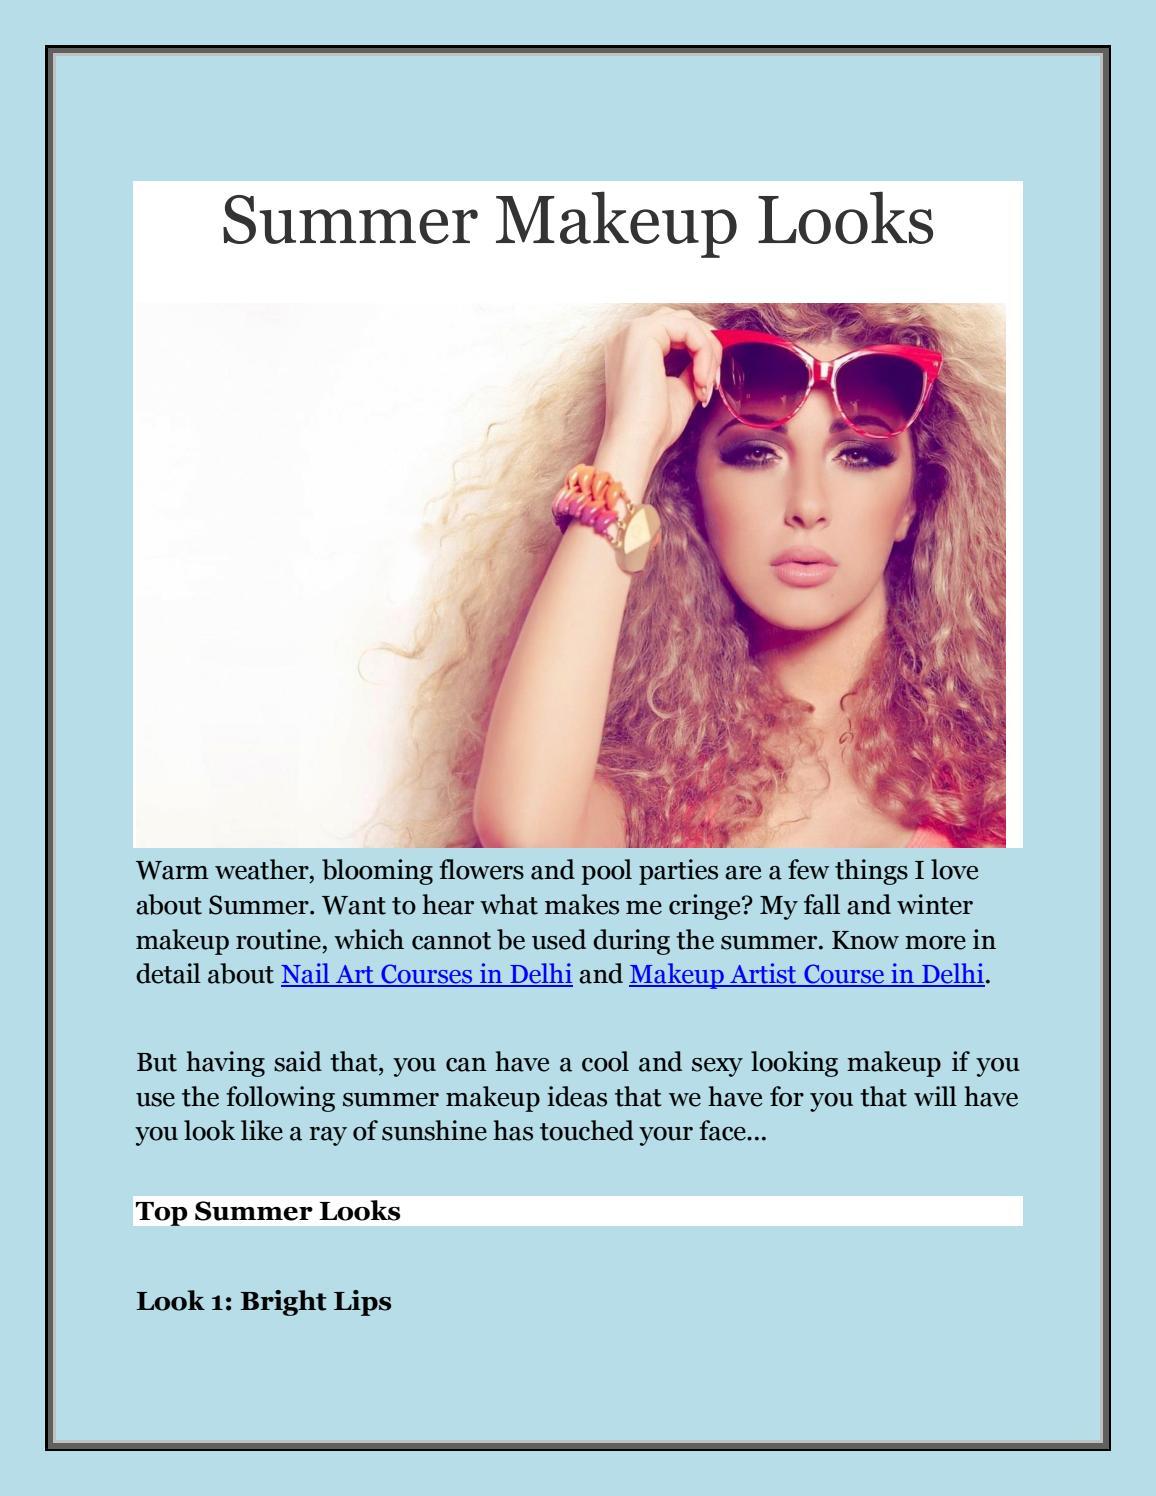 Summer Makeup Looks By Sabrina D Issuu